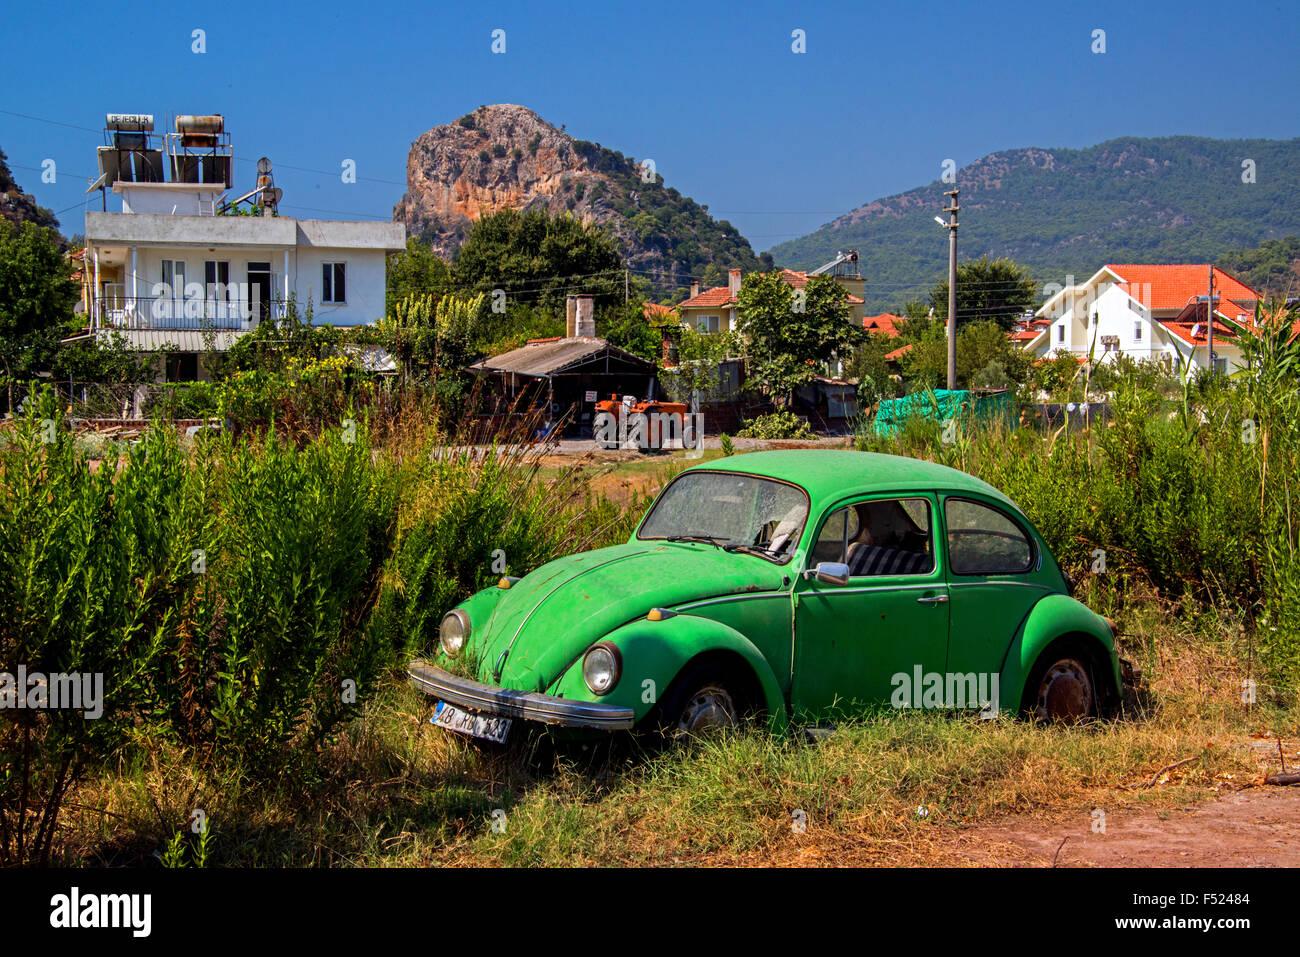 An abandoned Beetle VW1302. Reg 48 RD 523. Location.Emin Tezcan, Sokak, (TN-27) Dalyan, Mugla province. Turkey. - Stock Image